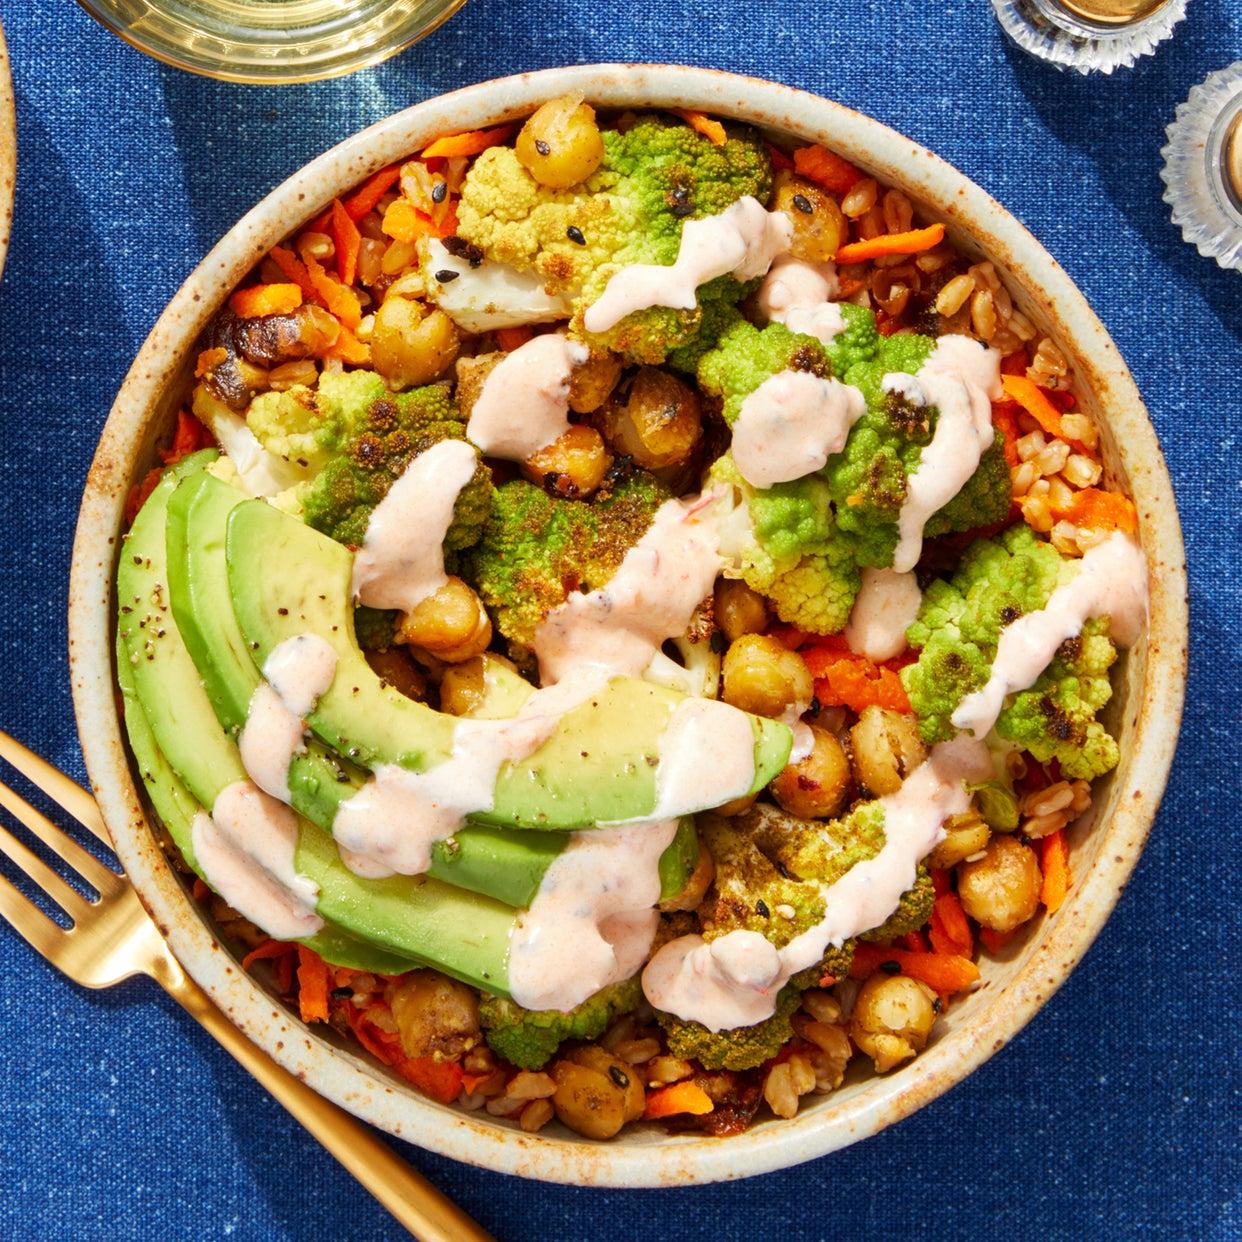 Spiced Cauliflower & Chickpea Bowl with Avocado, Dates, & Harissa Yogurt